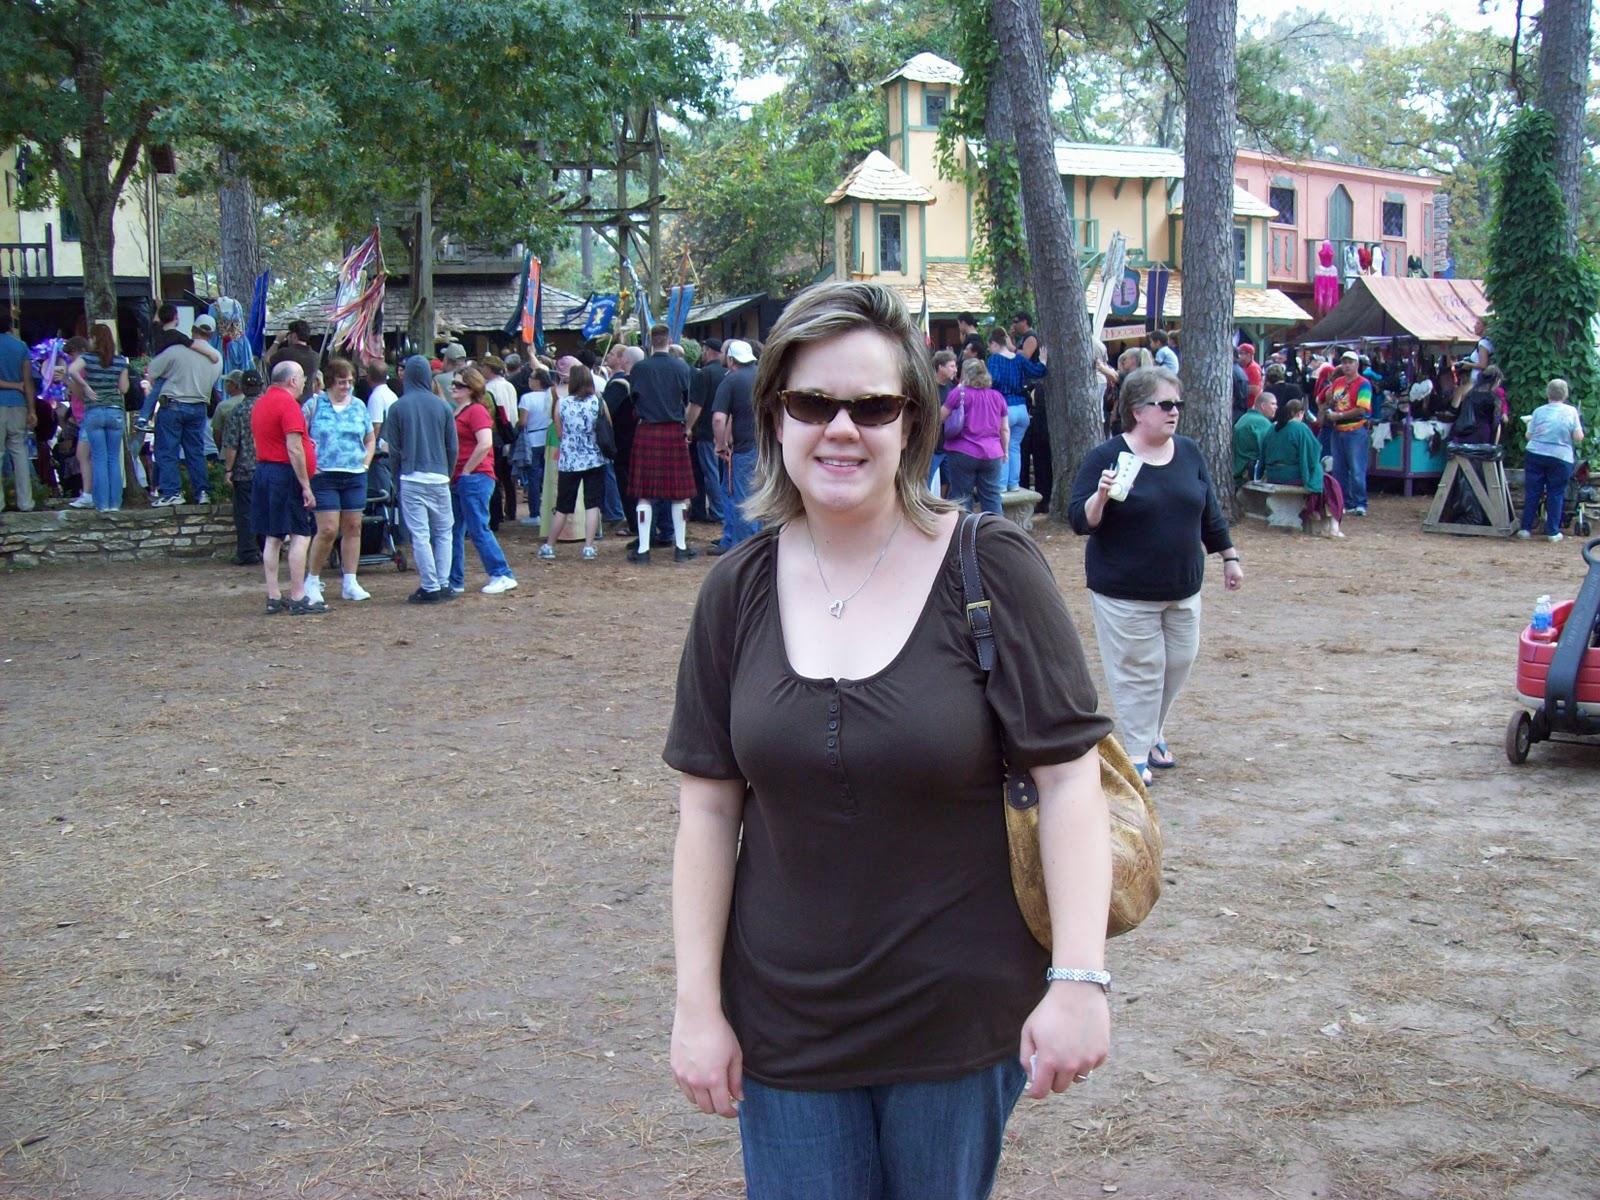 Texas Renaissance Festival - 101_5775.JPG